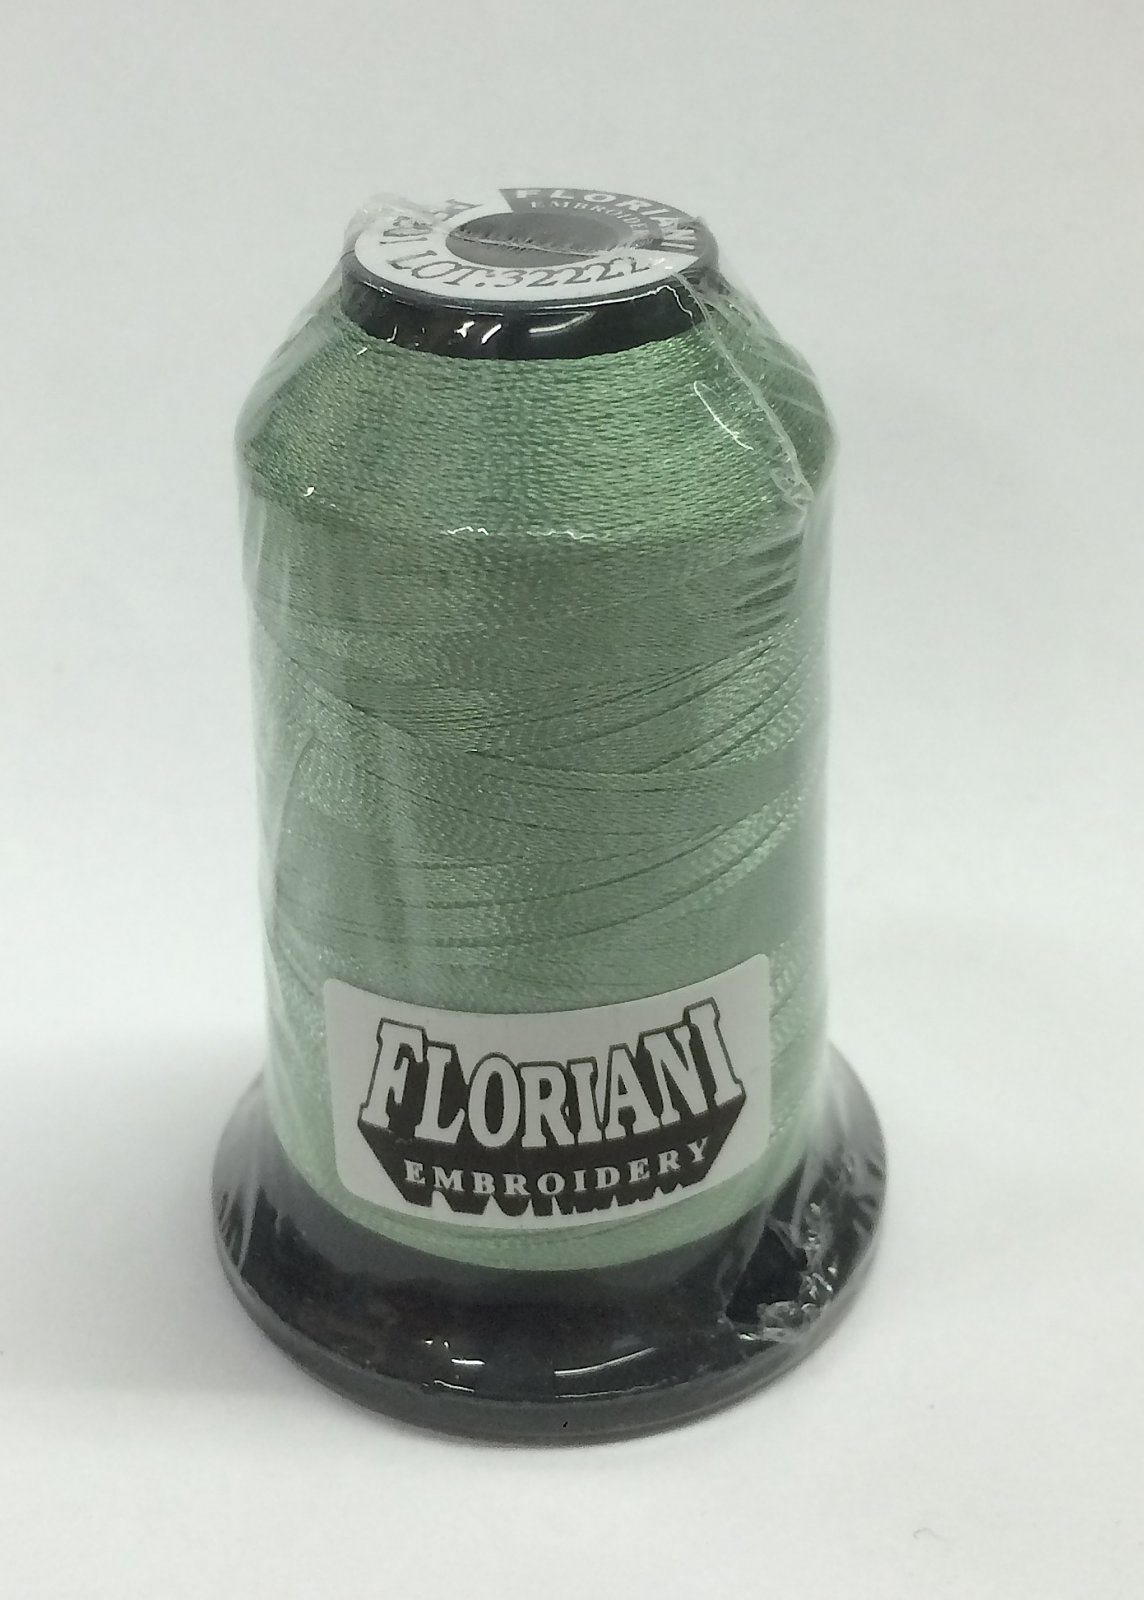 Floriani Embroidery Thread Color #0201